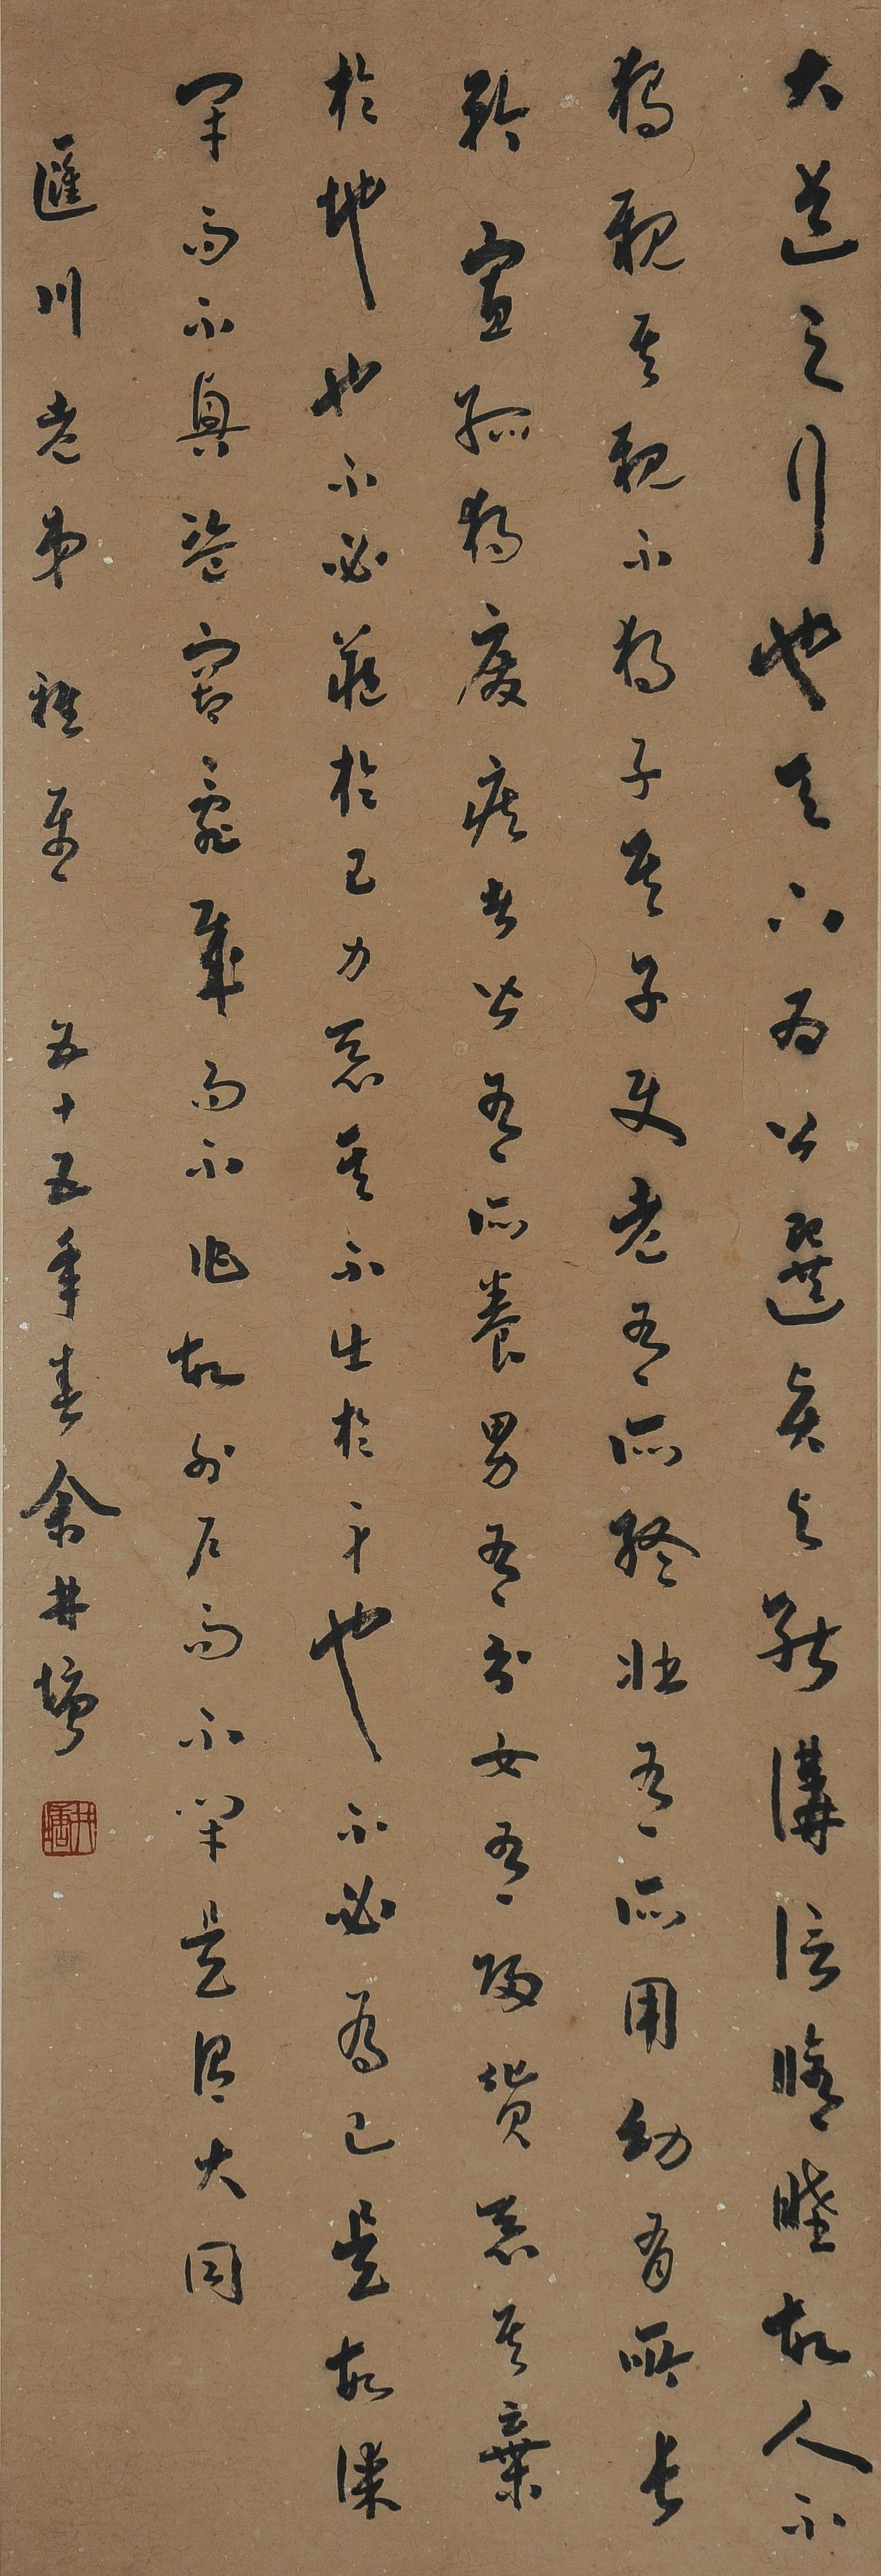 Chinese Calligraphy by Yu Jingyong